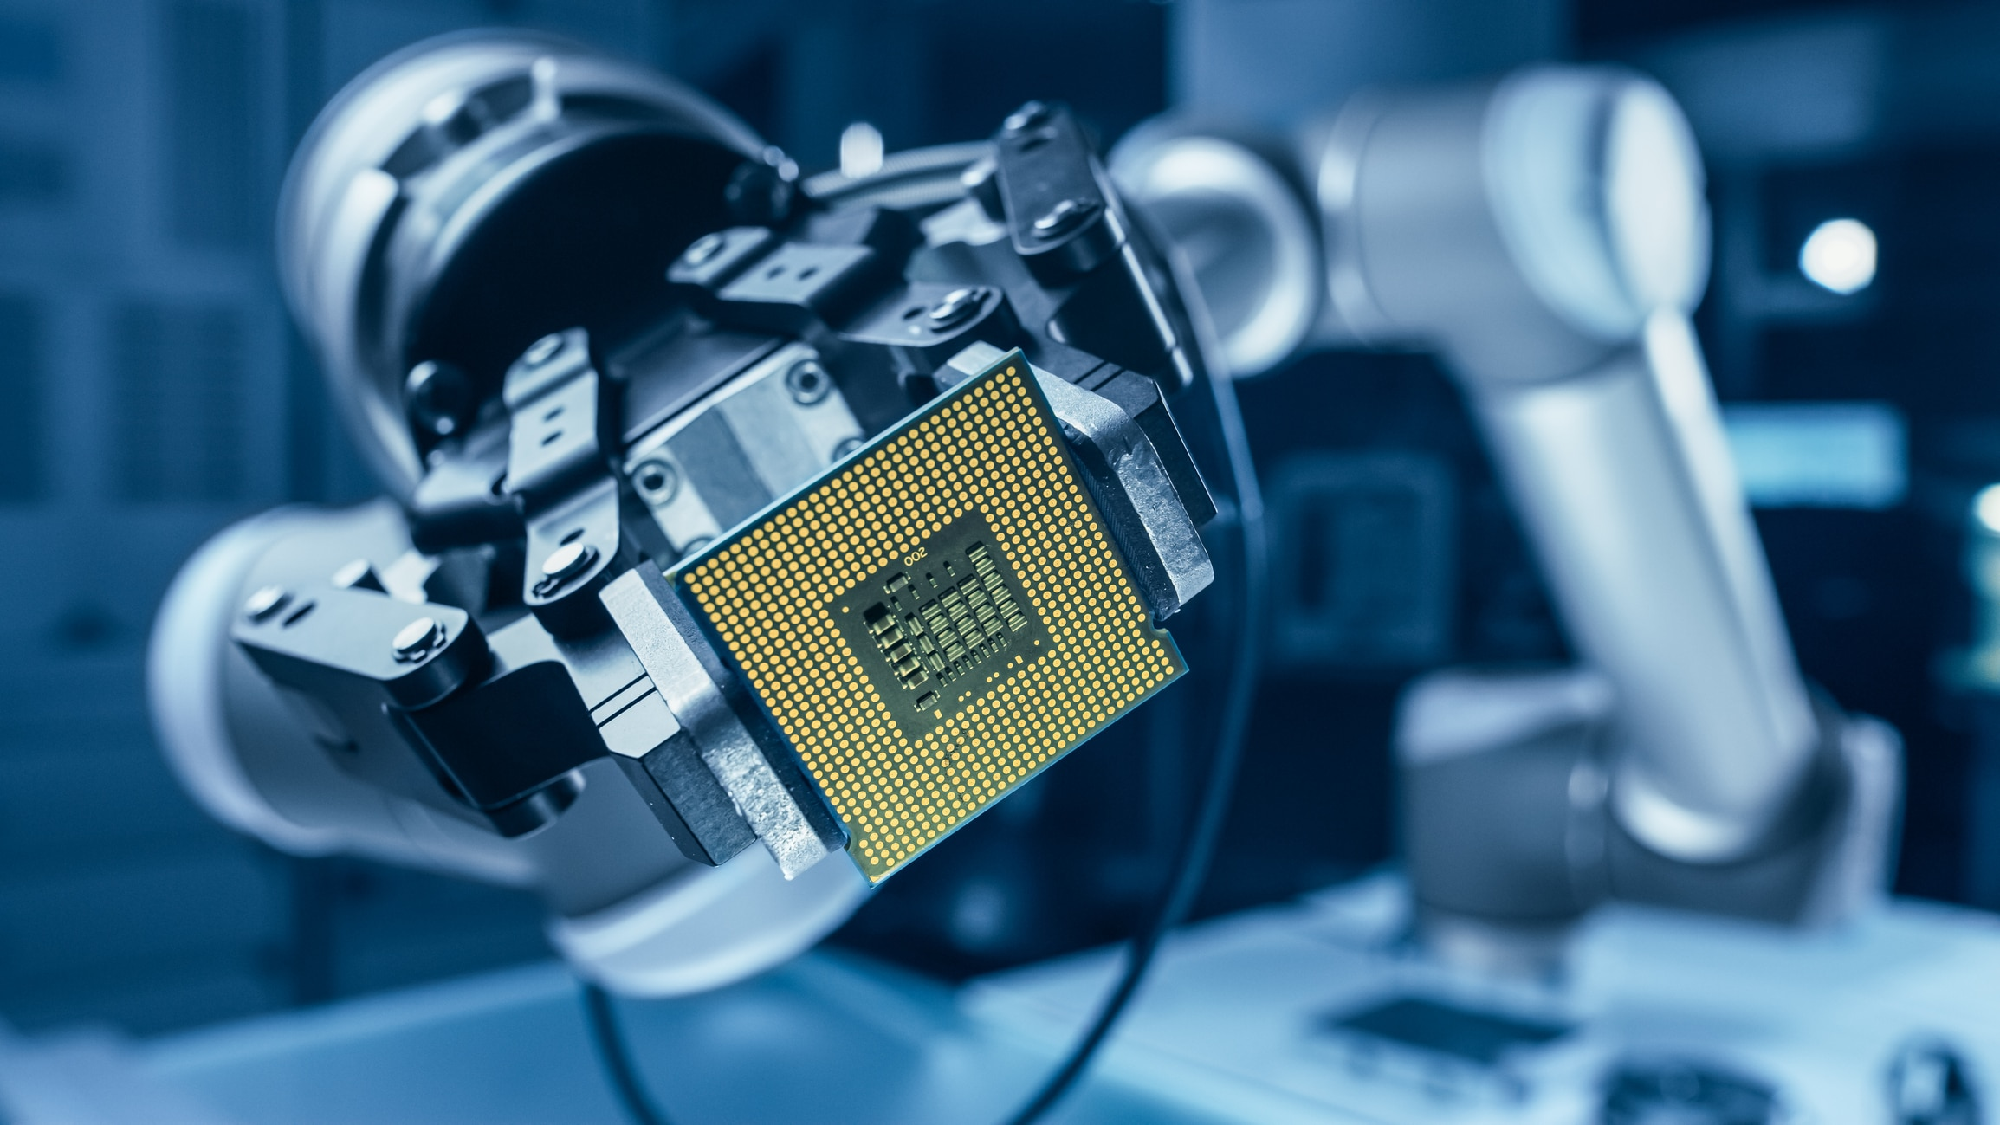 Crise mundial de semicondutores deve durar até 2022 - Olhar Digital